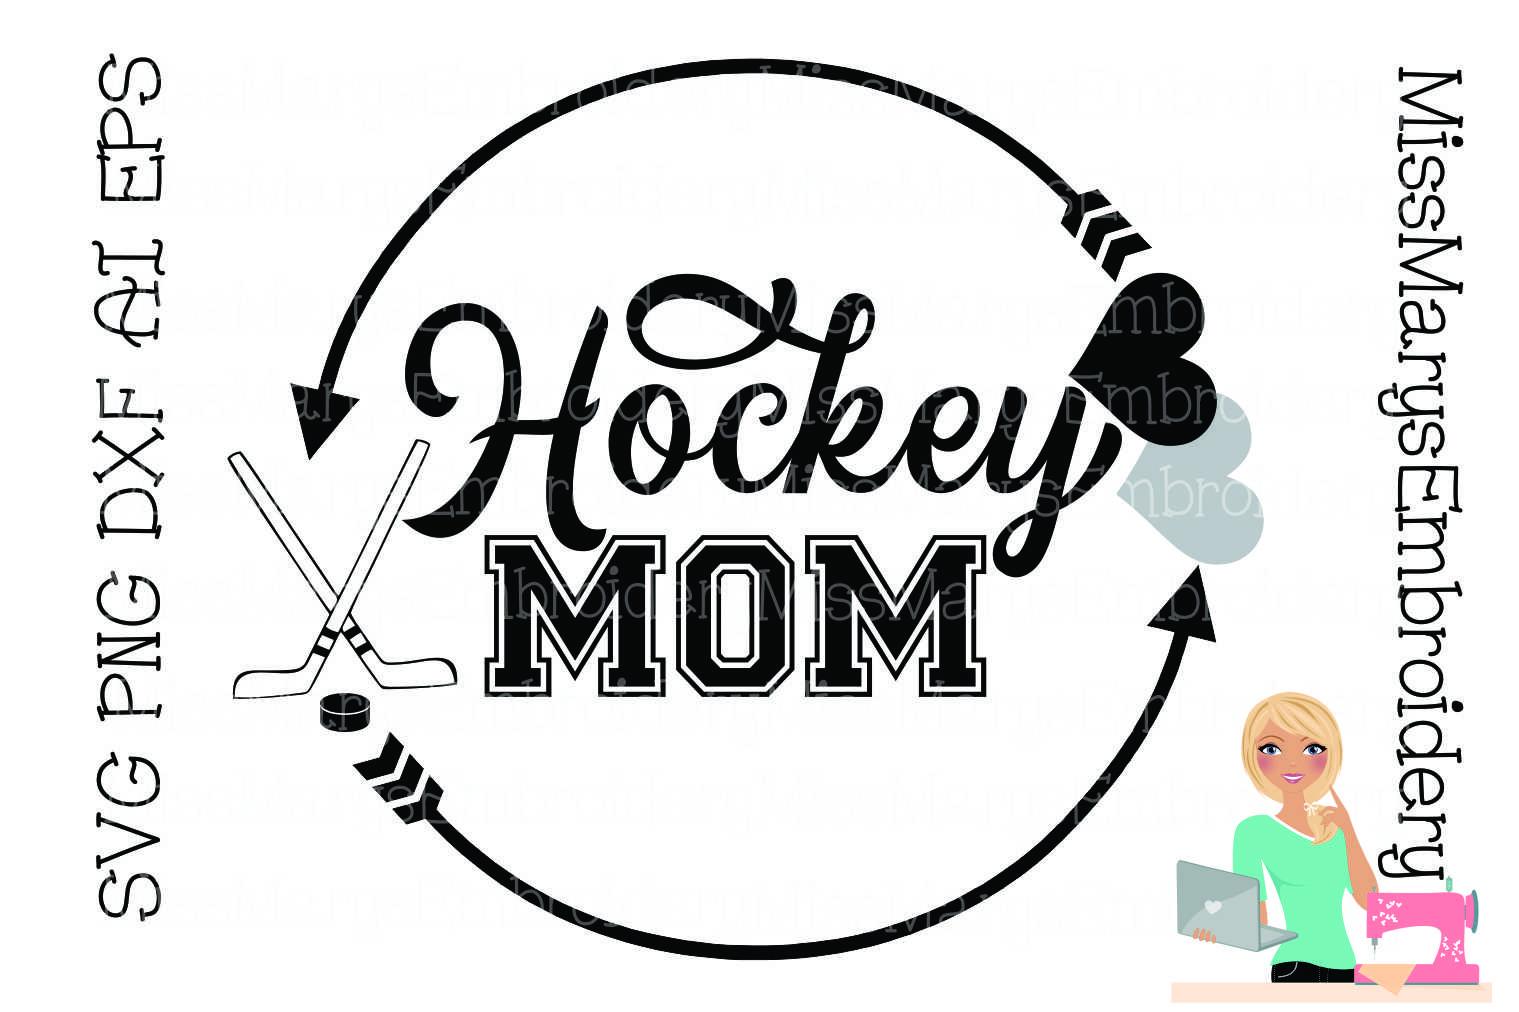 Hockey Mom SVG Cutting File PNG DXF AI EPS Hockey example image 1